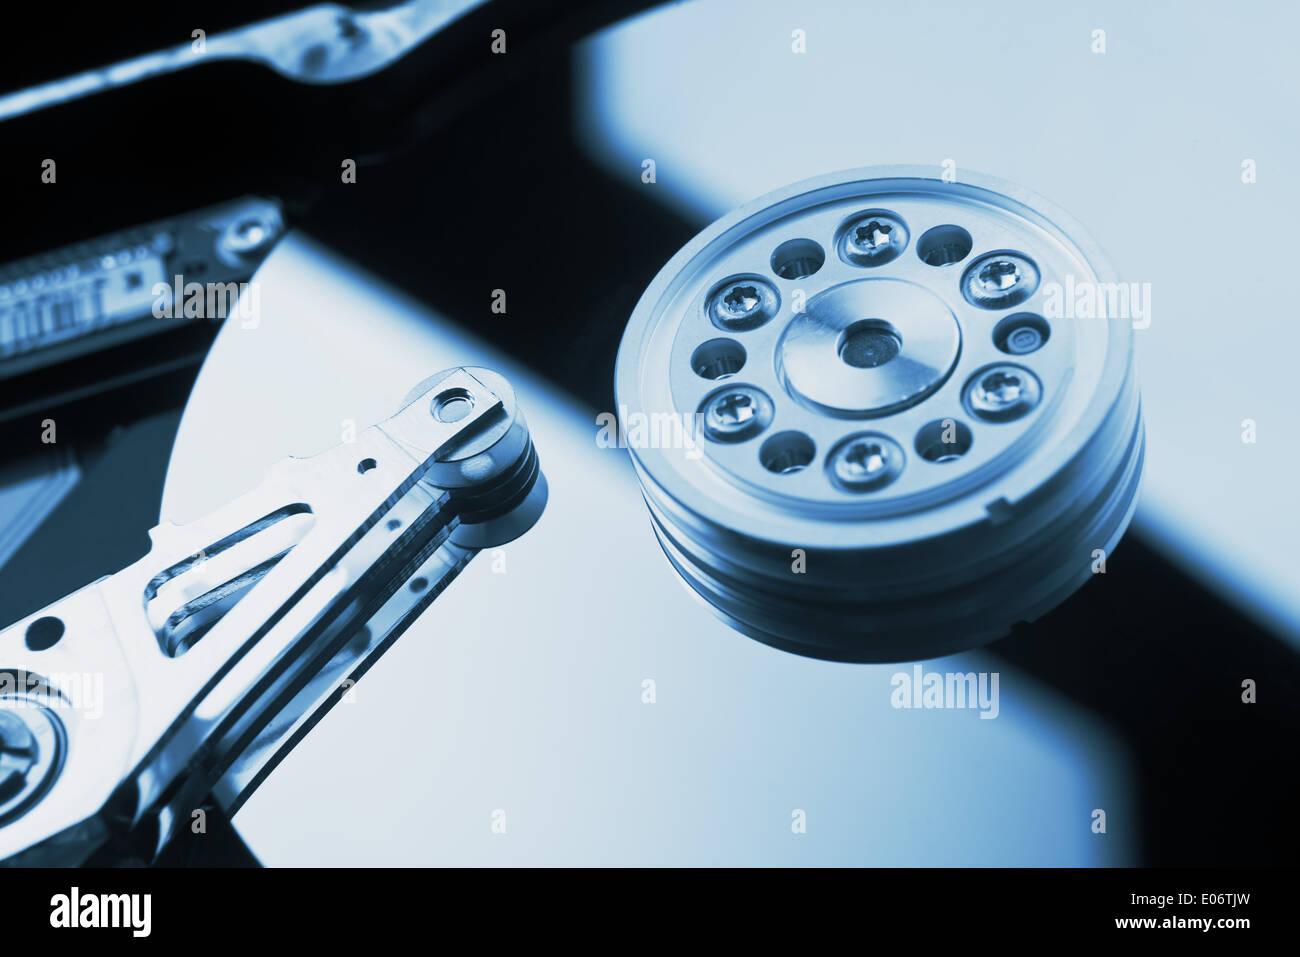 Computer hard disk close up. Computer Hardware. - Stock Image